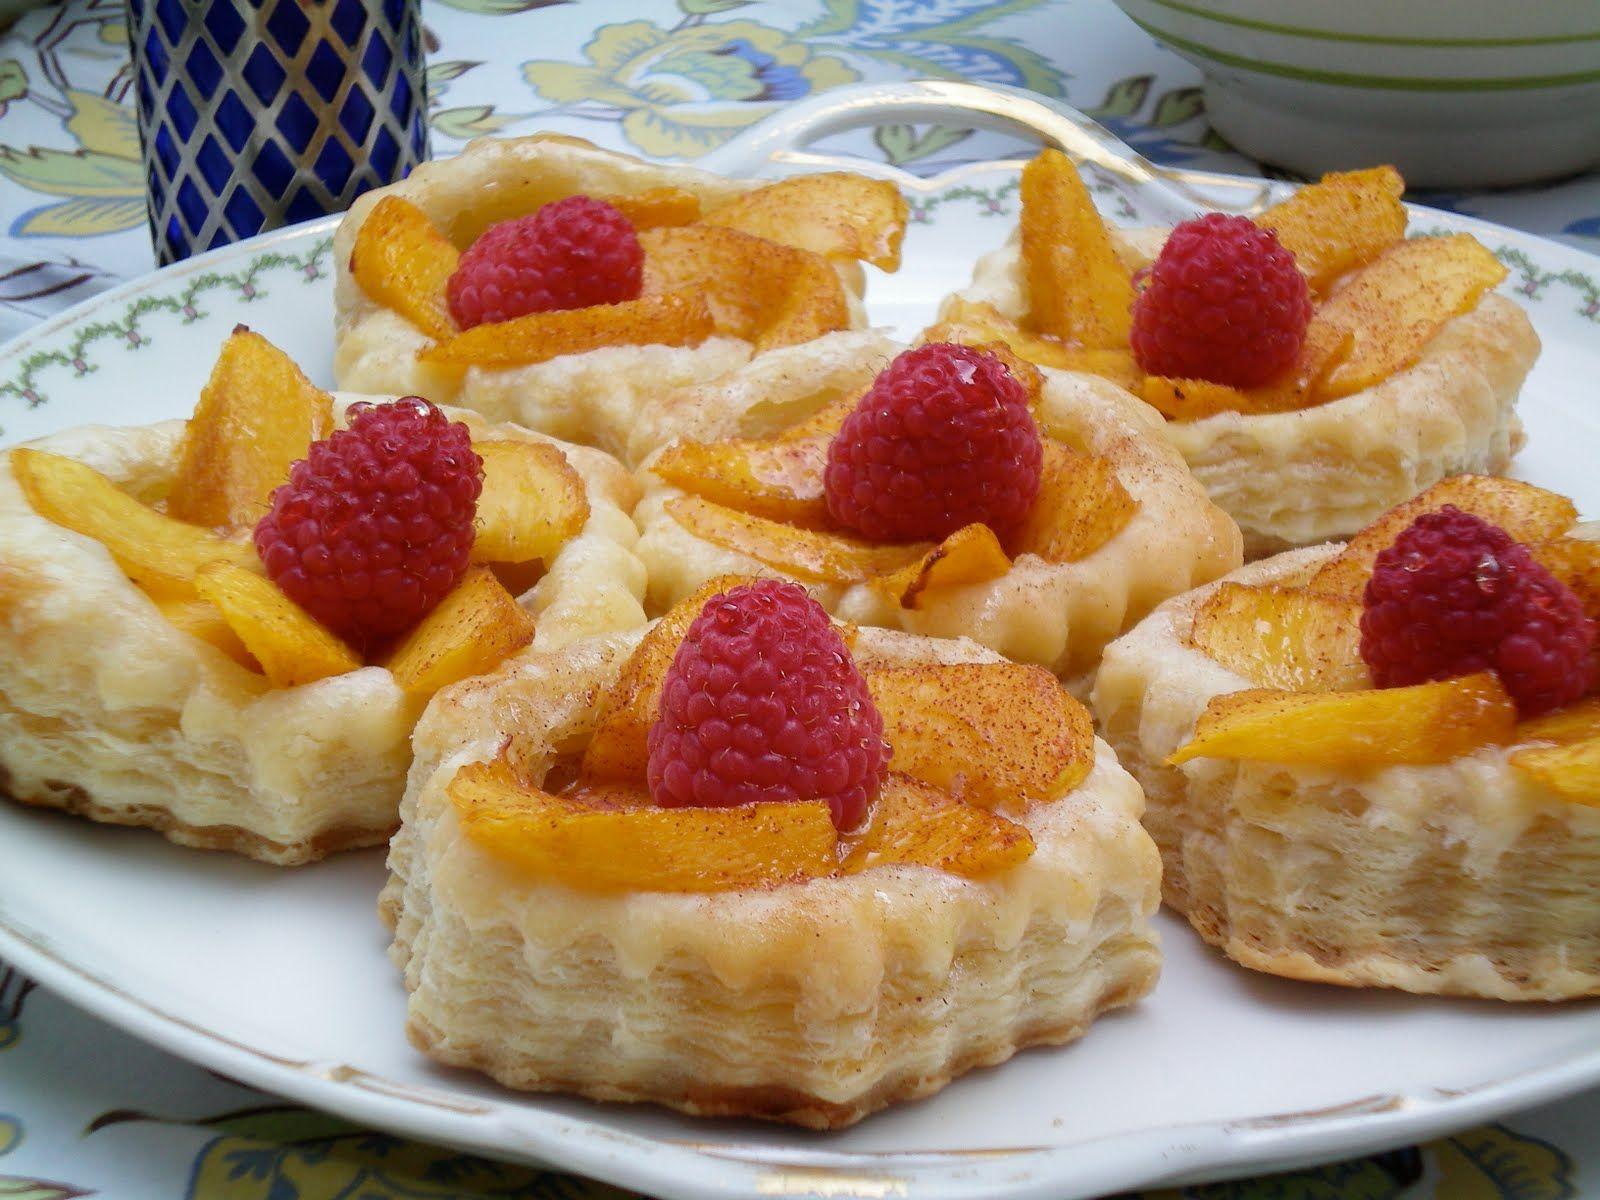 Spanish dessert recipes spanishdessertrecipesg lets get spanish dessert recipes spanishdessertrecipesg forumfinder Image collections